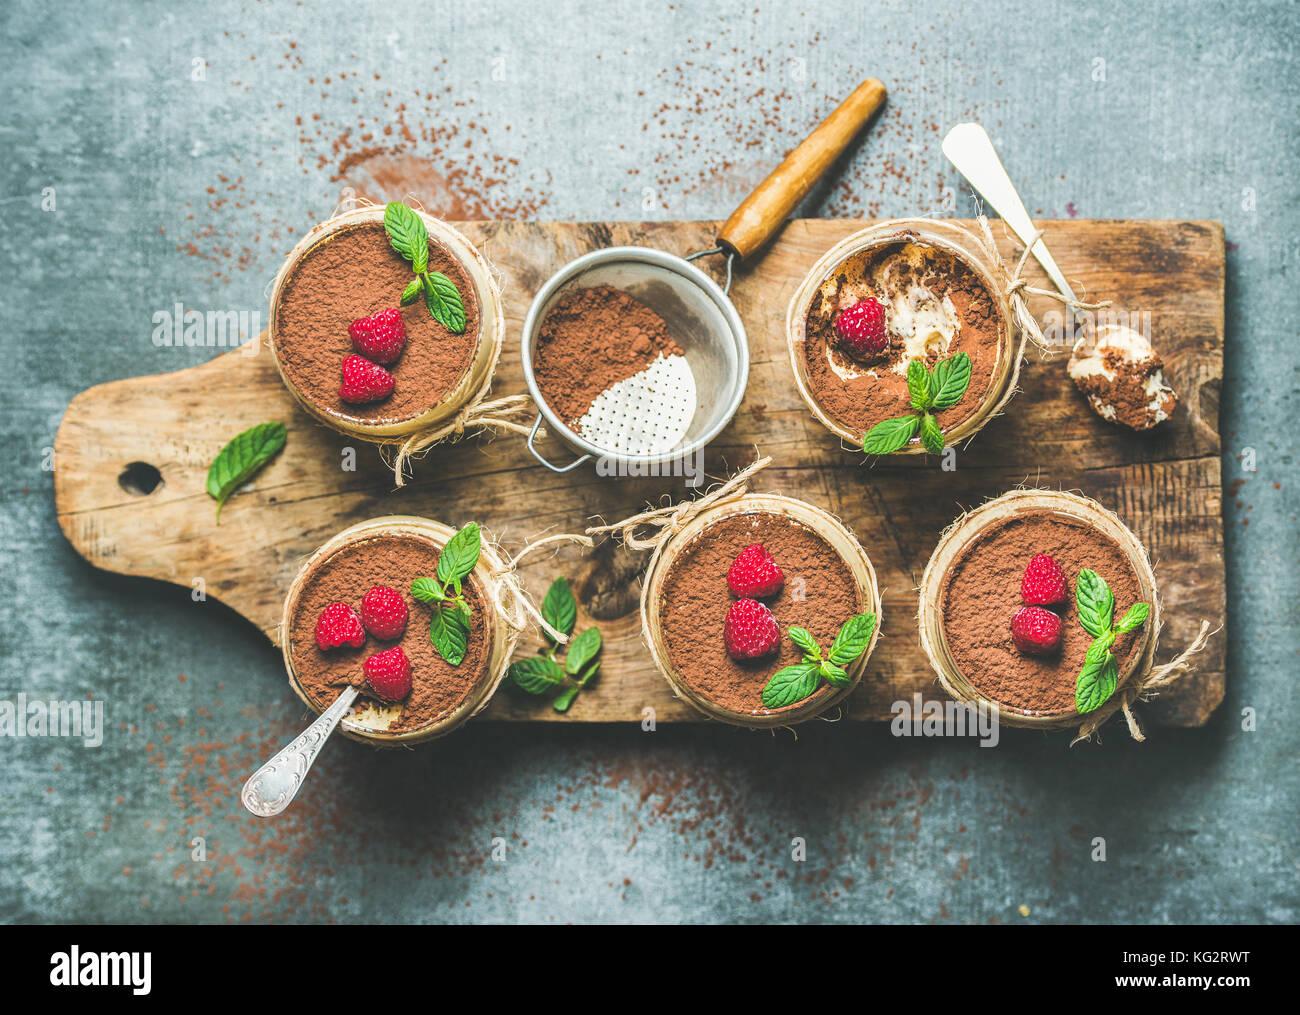 Homemade dessert Tiramisu in glasses on wooden board - Stock Image